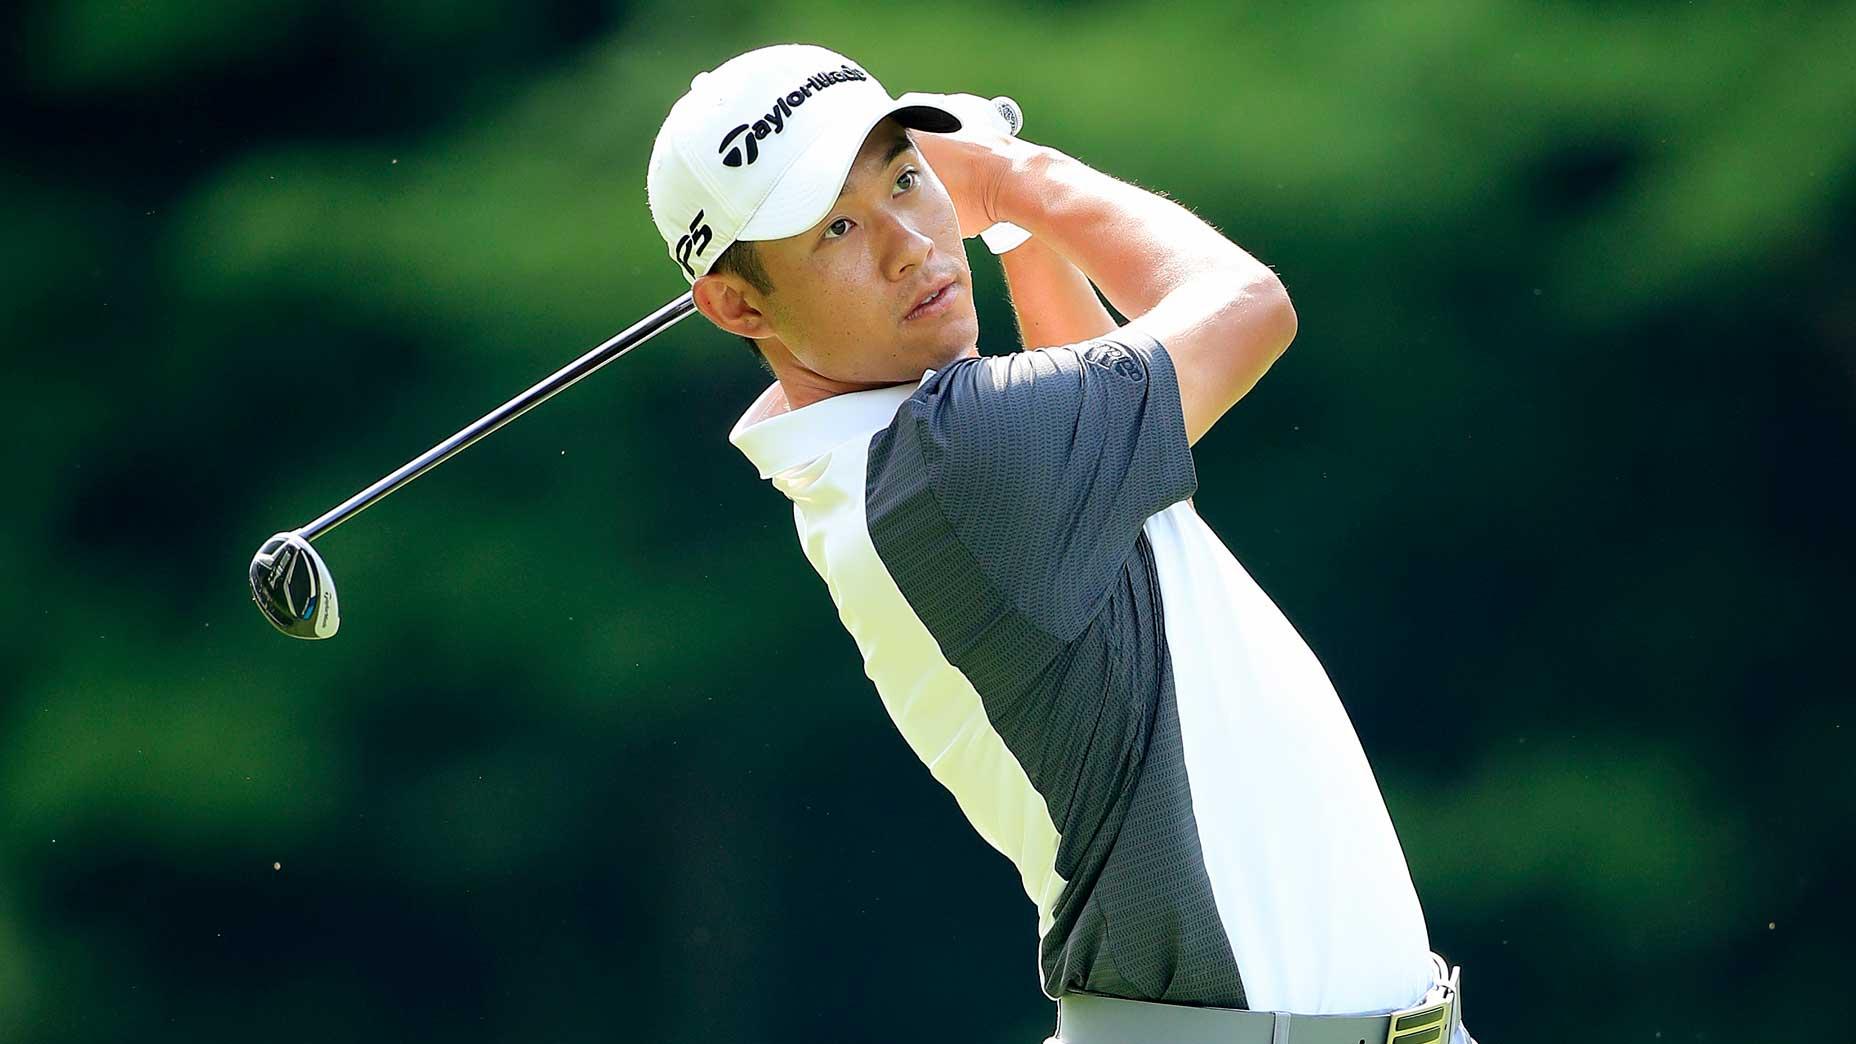 Pro golfer Collin Morikawa